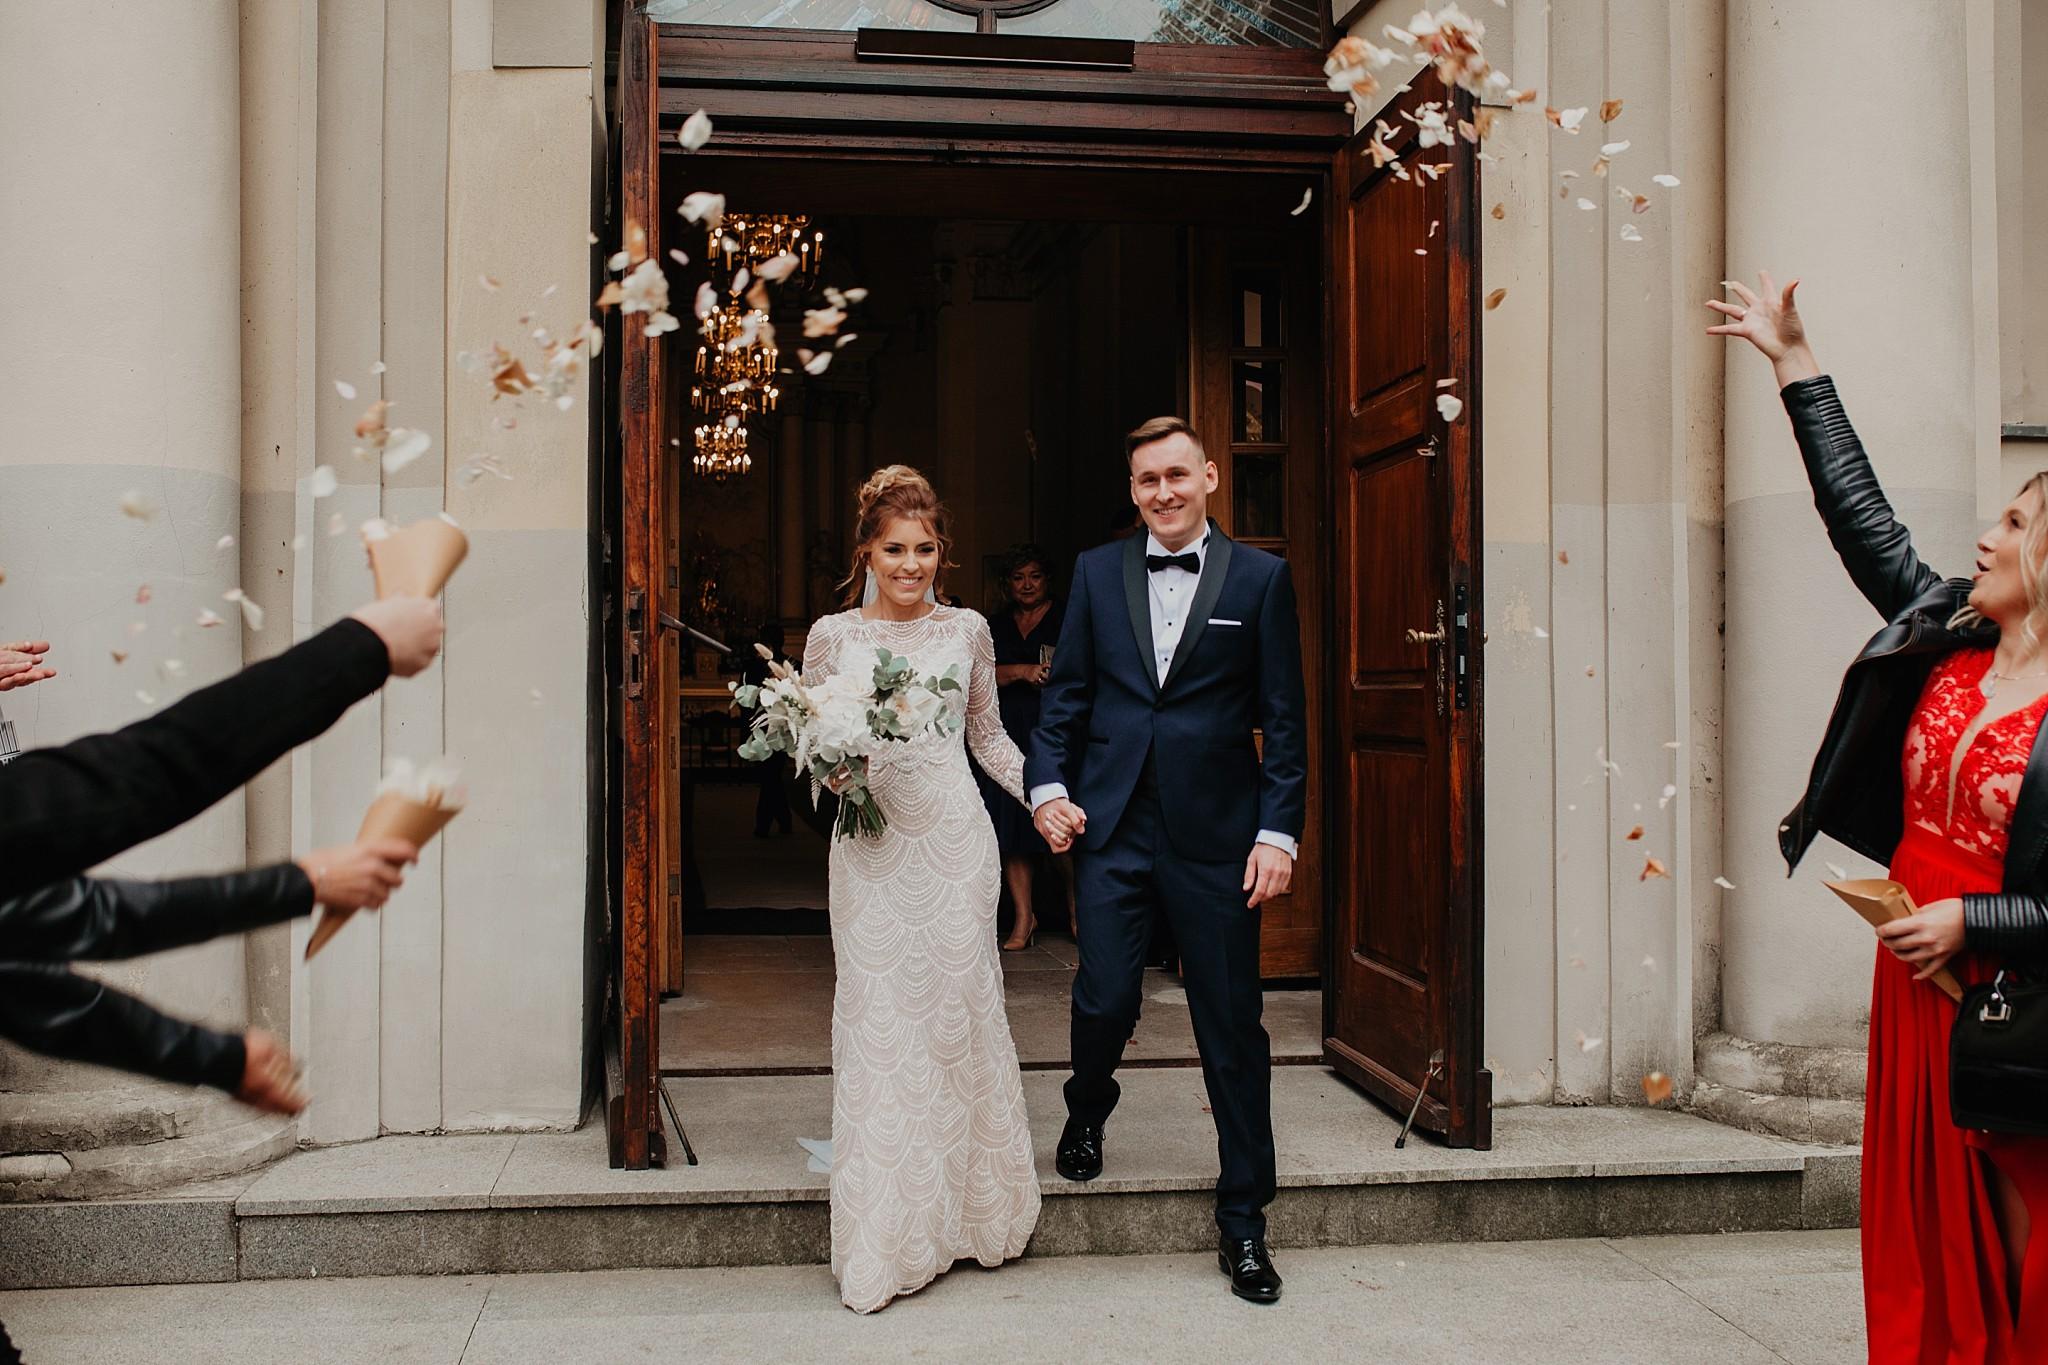 fotograf poznan wesele dobra truskawka piekne wesele pod poznaniem wesele w dobrej truskawce piekna para mloda slub marzen slub koronawirus slub listopad wesele koronawirus 216